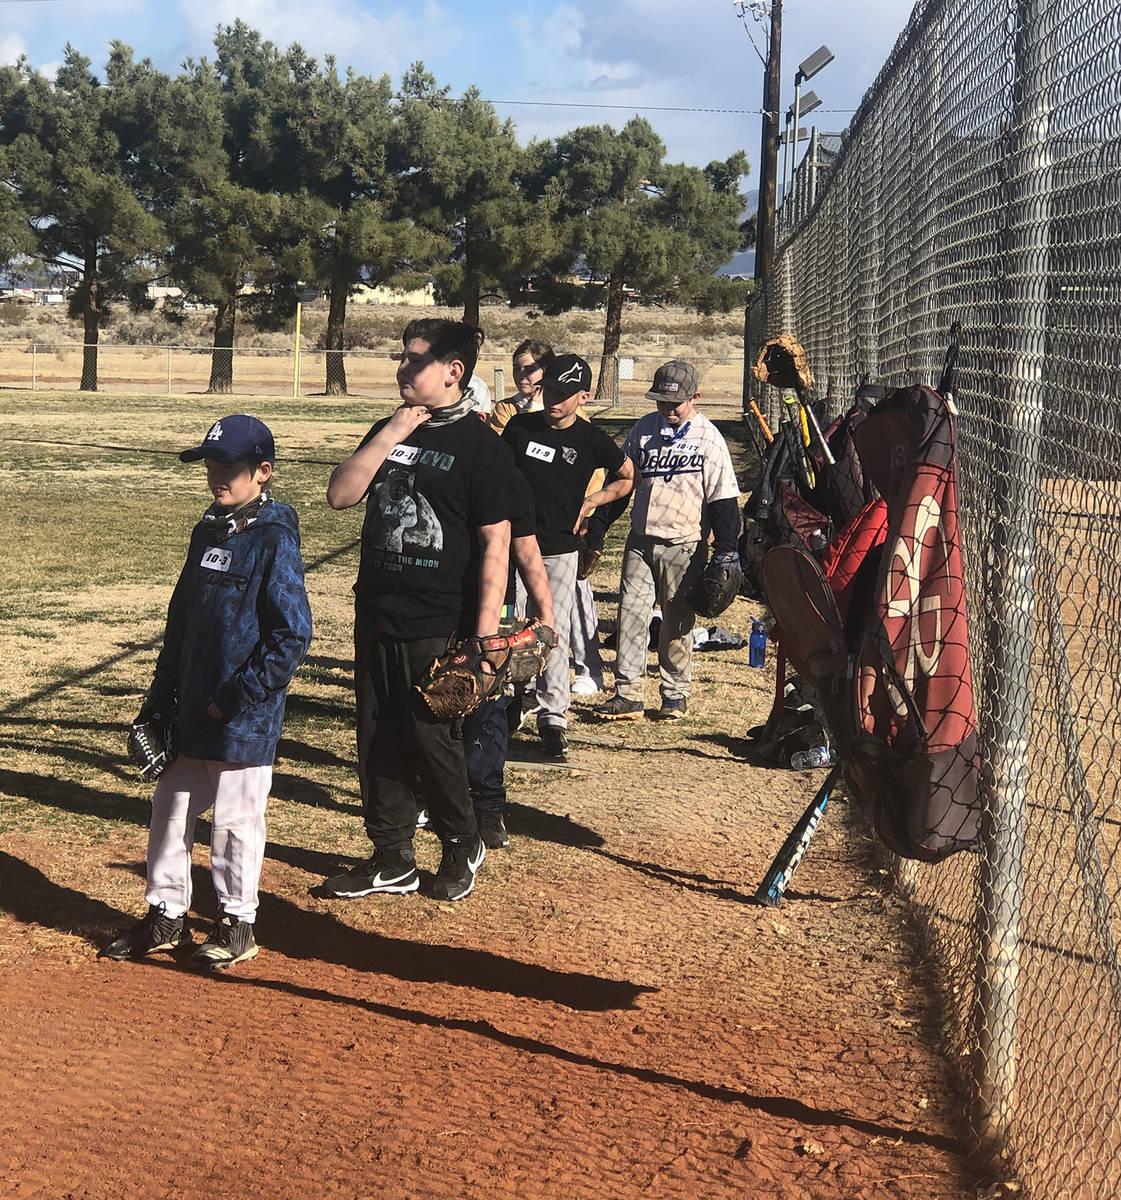 Tom Rysinski/Pahrump Valley Times Prospective baseball players line up for their turn at fieldi ...